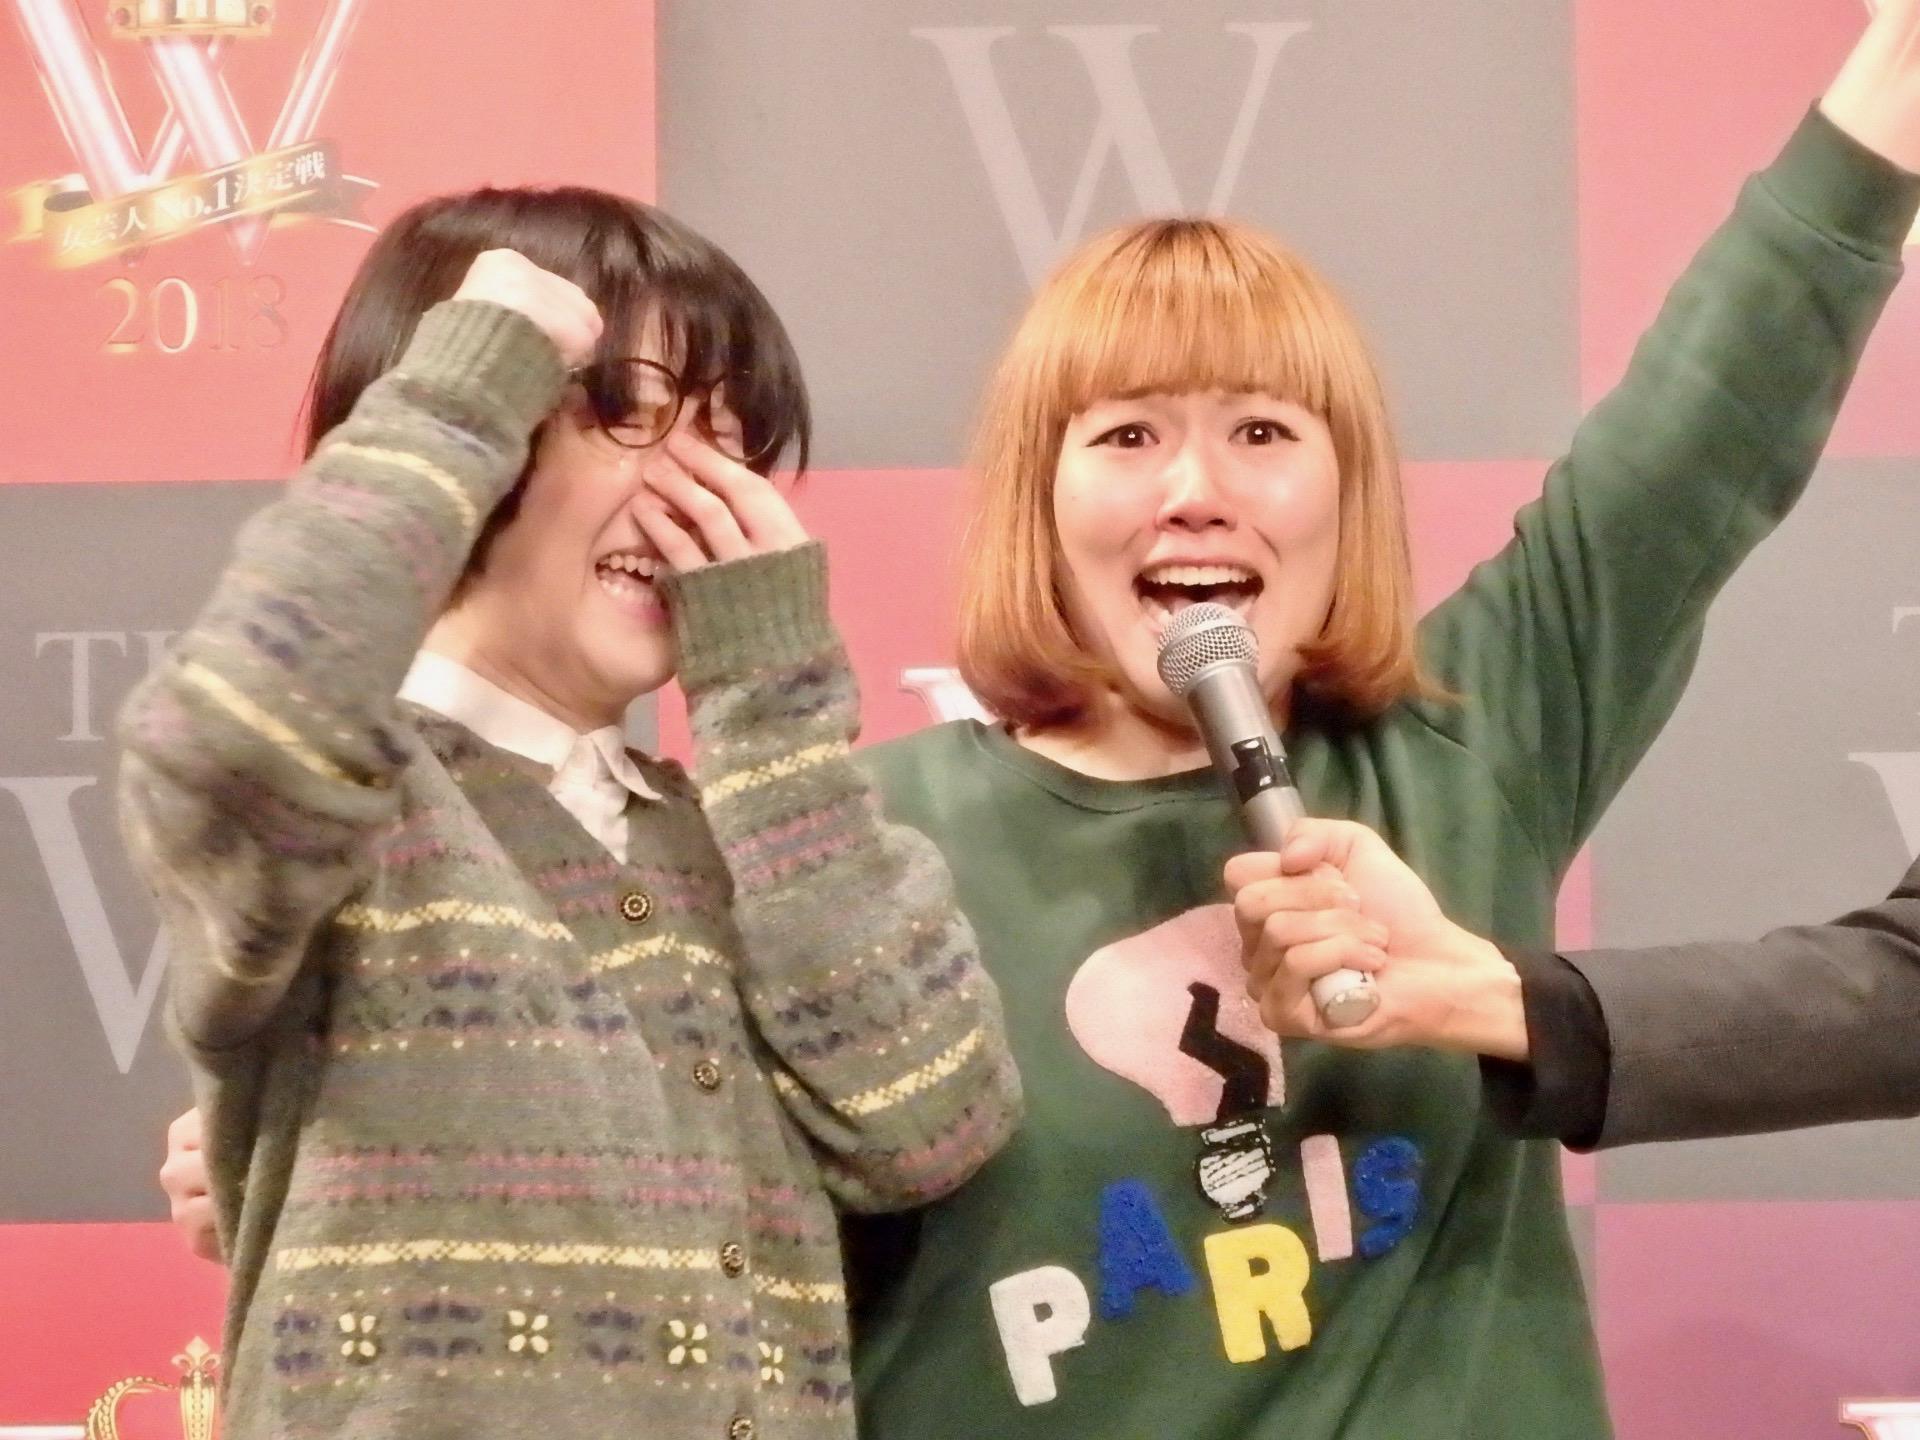 http://news.yoshimoto.co.jp/20181113085509-439fc3e541cf58491213315e8c780bfecfadc8b4.jpg